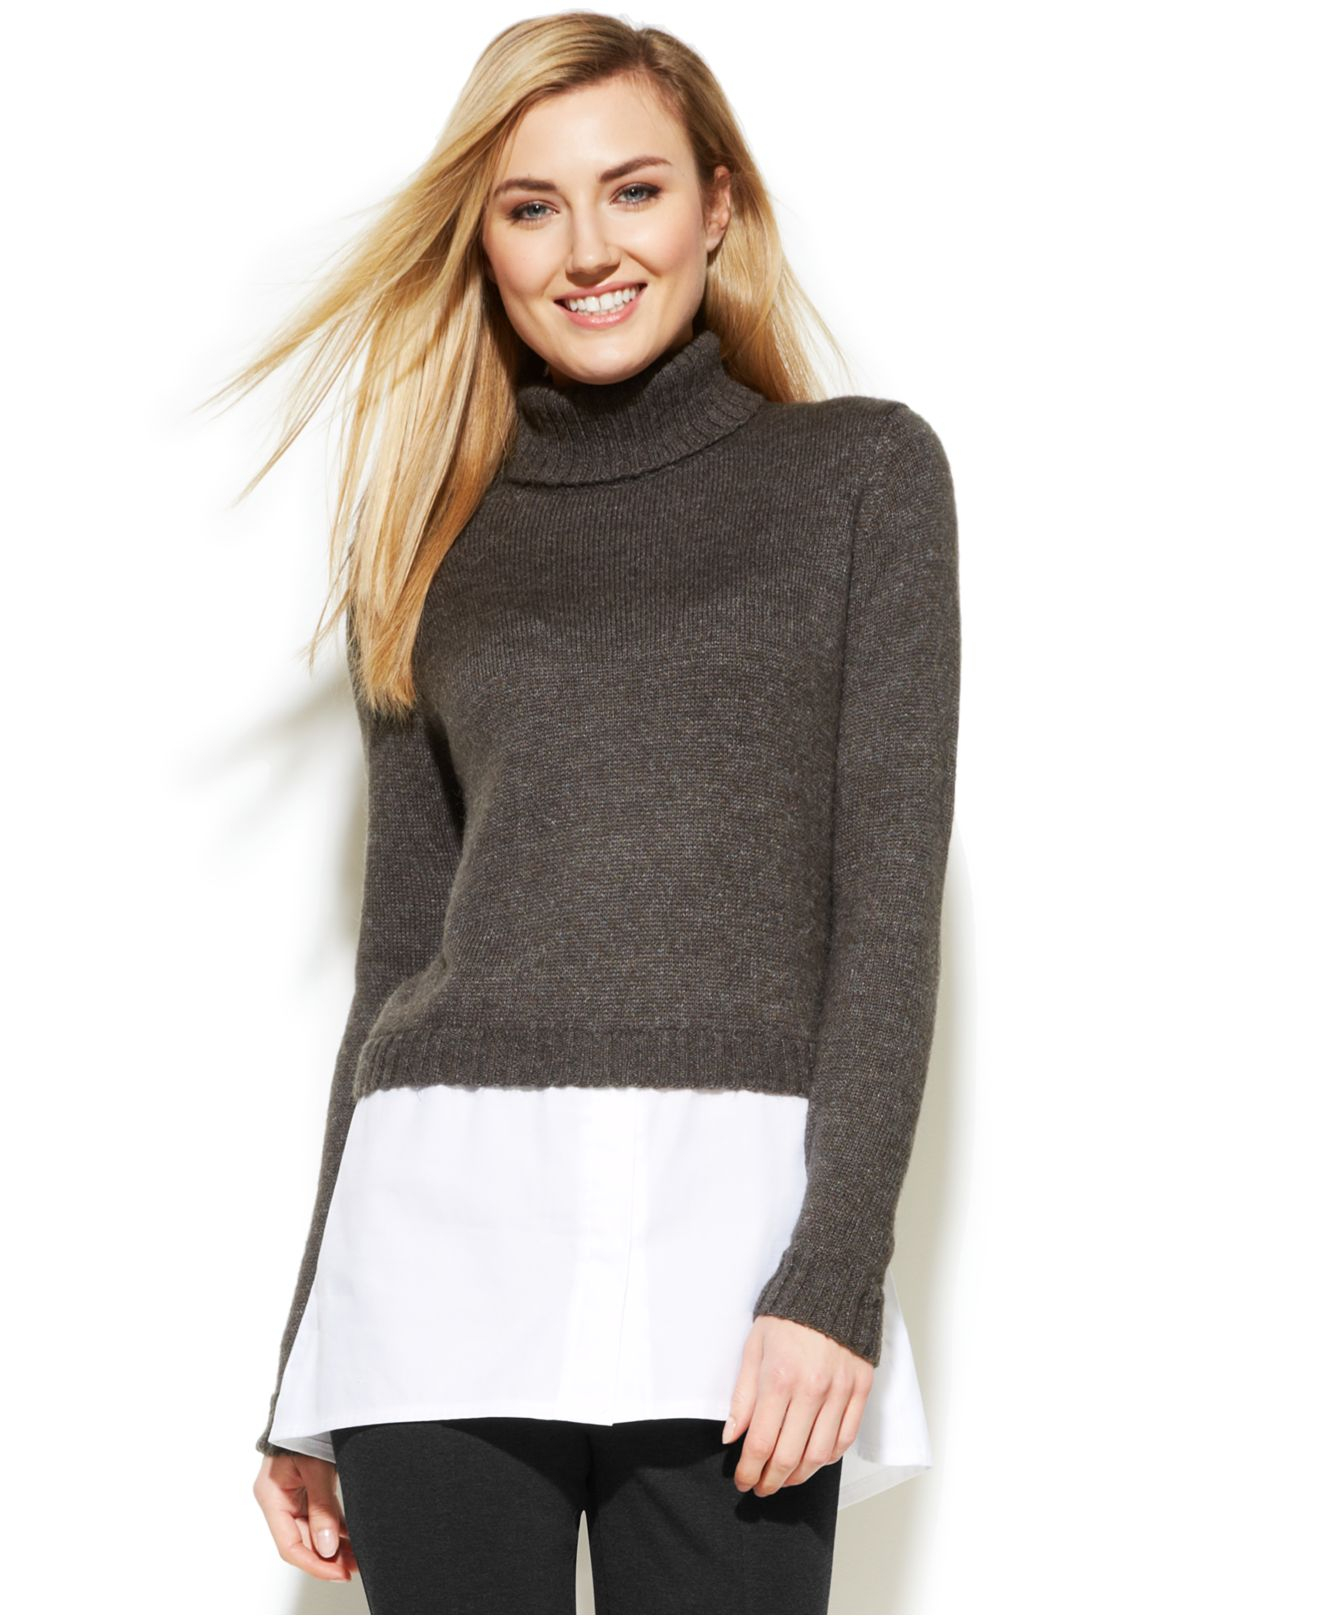 calvin klein layered look turtleneck sweater in gray lyst. Black Bedroom Furniture Sets. Home Design Ideas